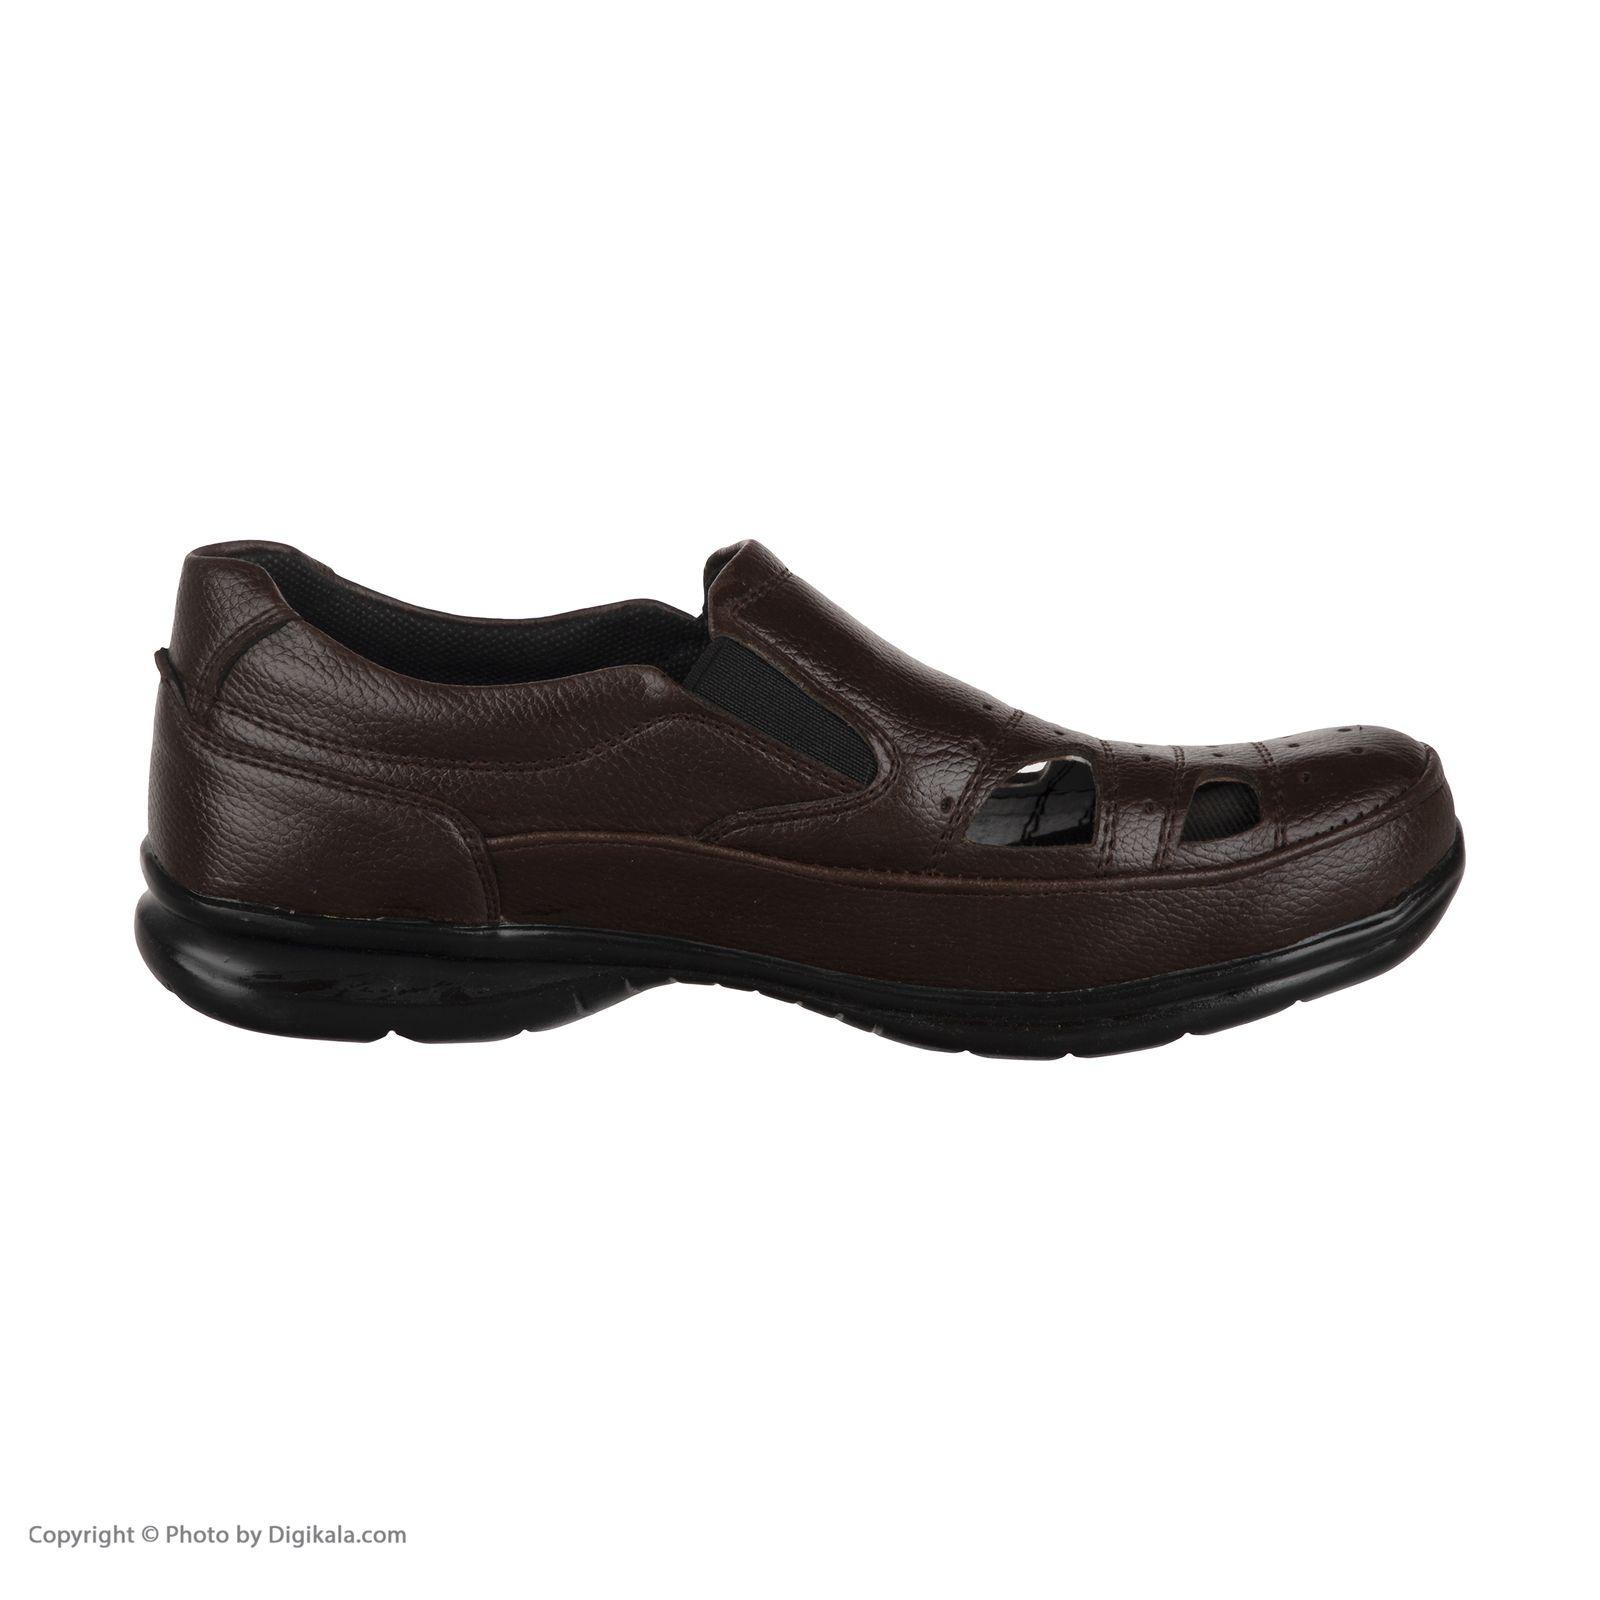 کفش روزمره مردانه مدل k.baz.076 -  - 7